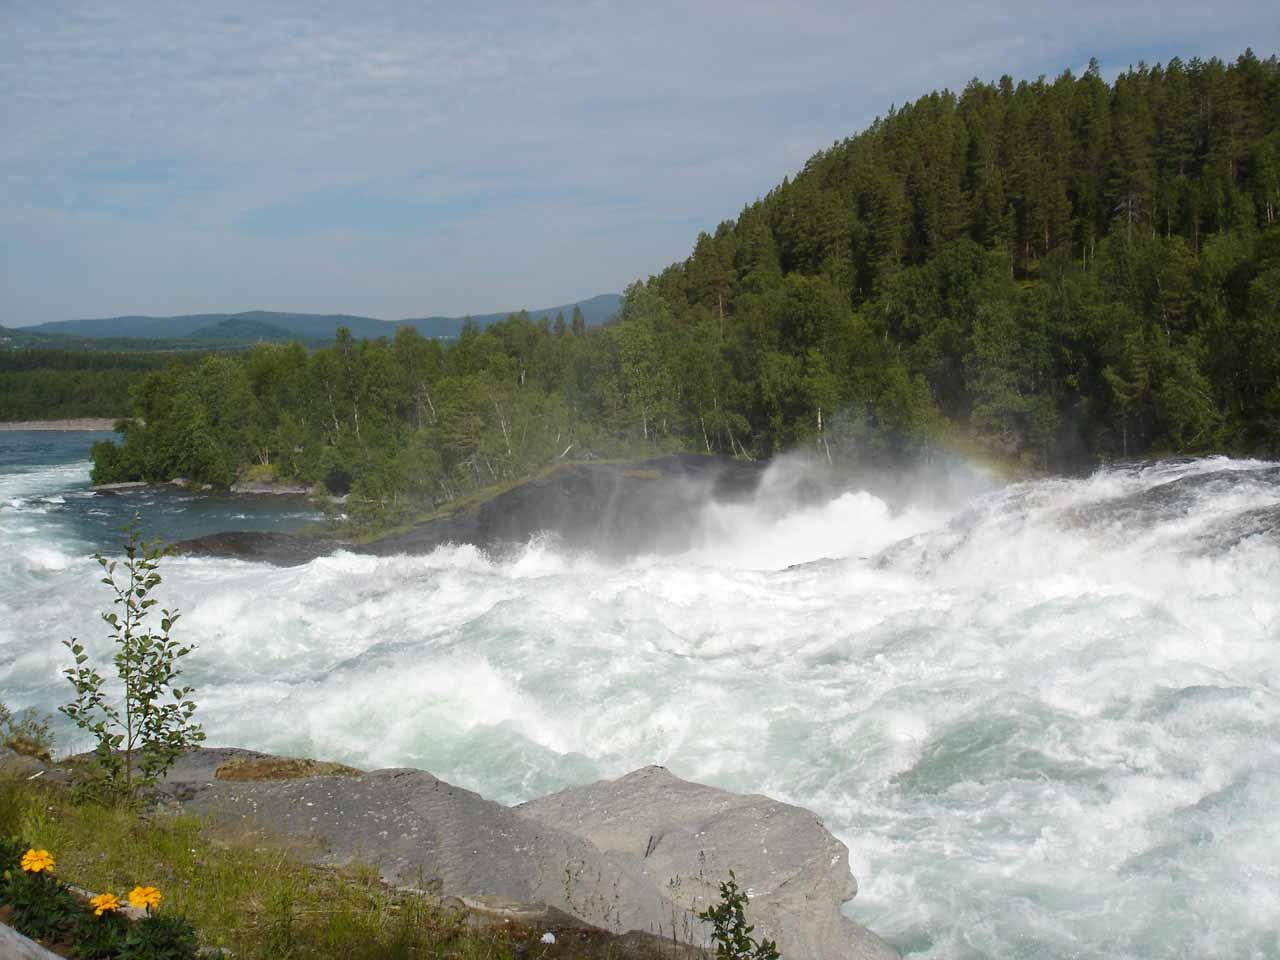 Looking a little further downstream from Målselvfossen